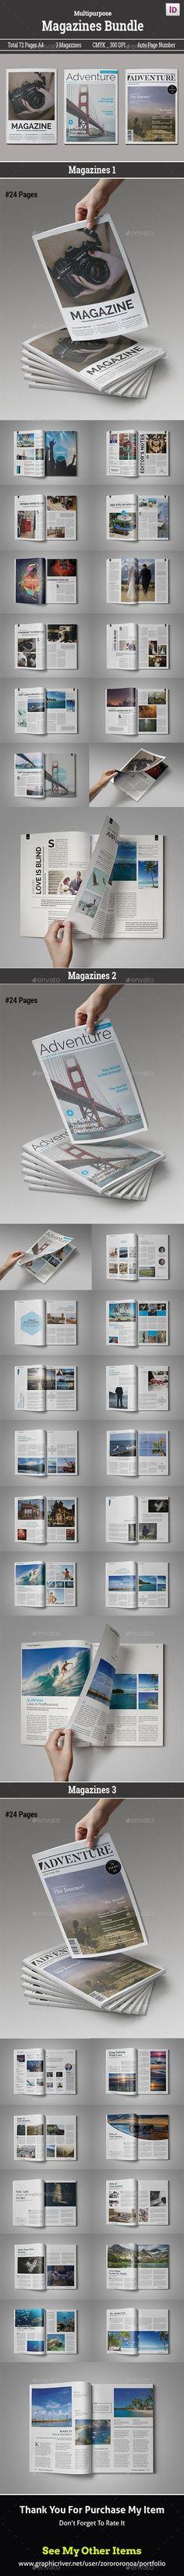 Magazines Bundle Templates InDesign INDD. Download here: http://graphicriver.net/item/magazines-bundle-volii/16401901?ref=ksioks